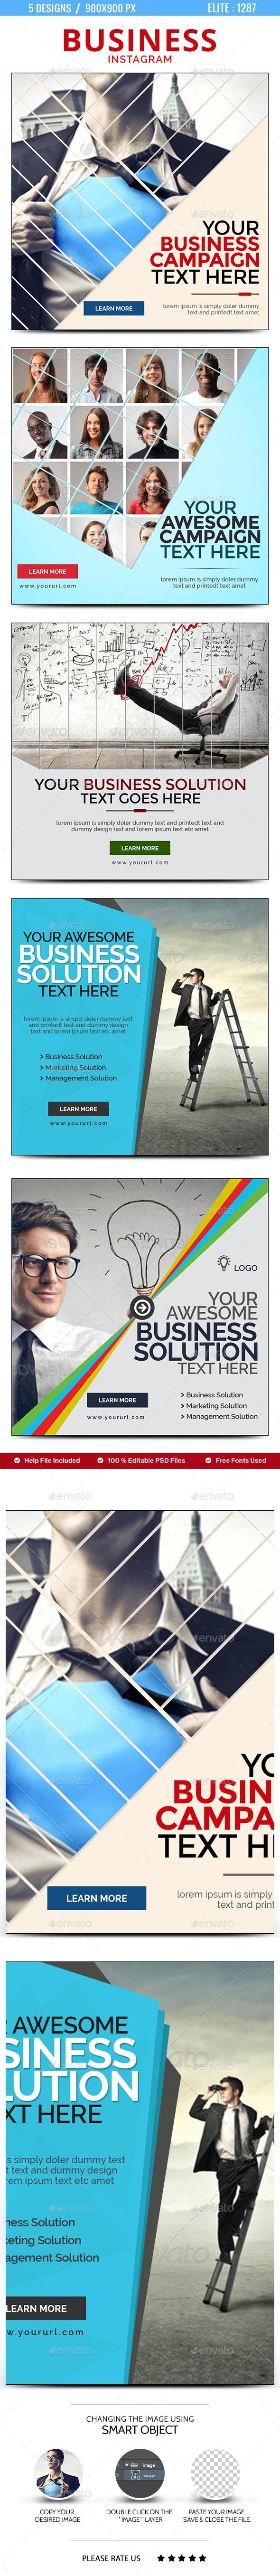 Business Instagram Templates - 5 Designs - Social Media Web Elements